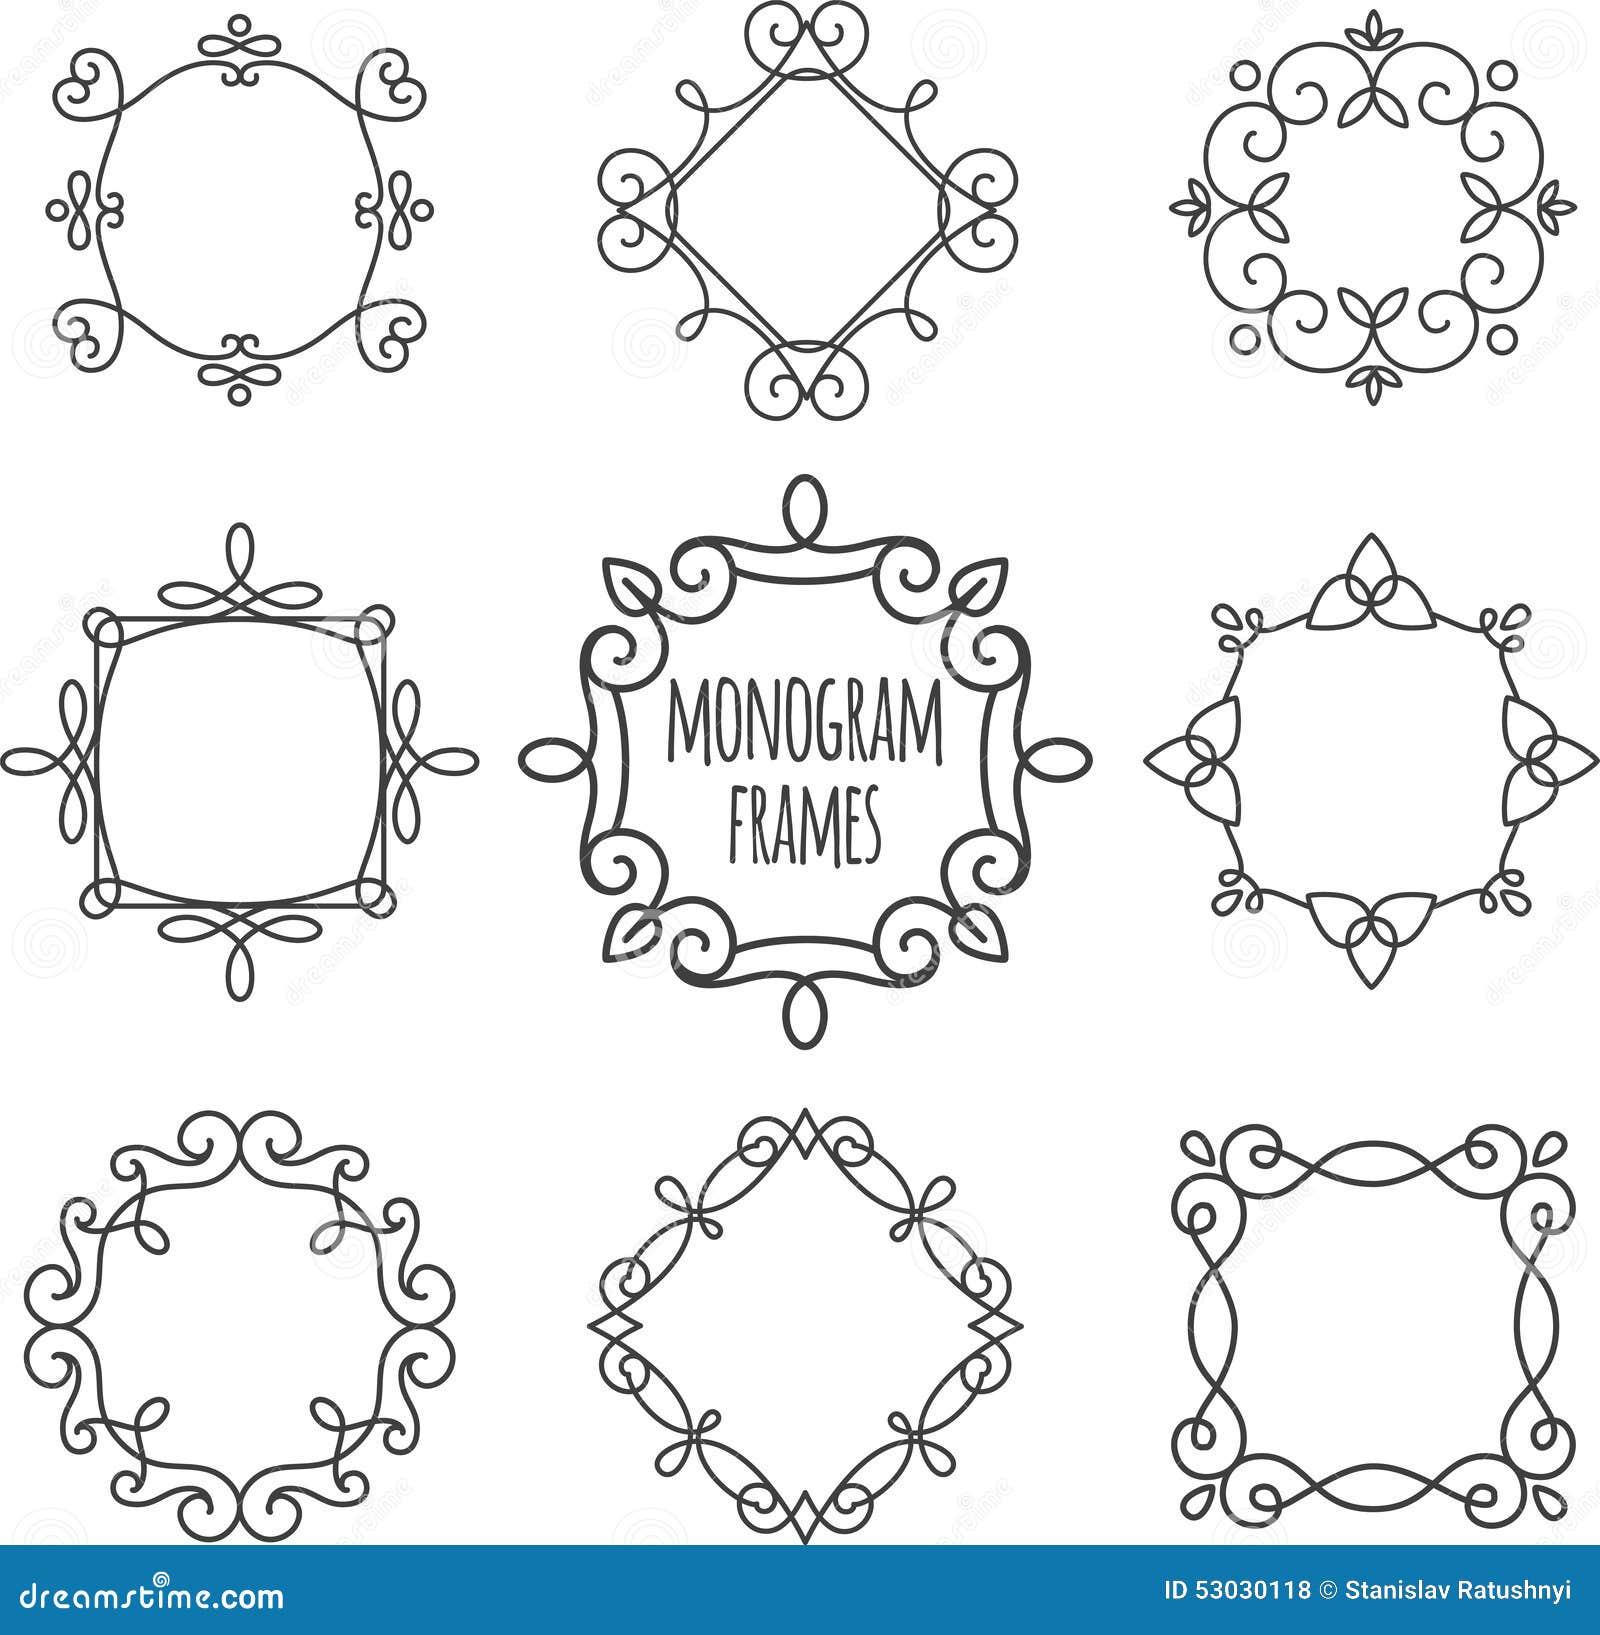 monogram frames set - Monogram Frames